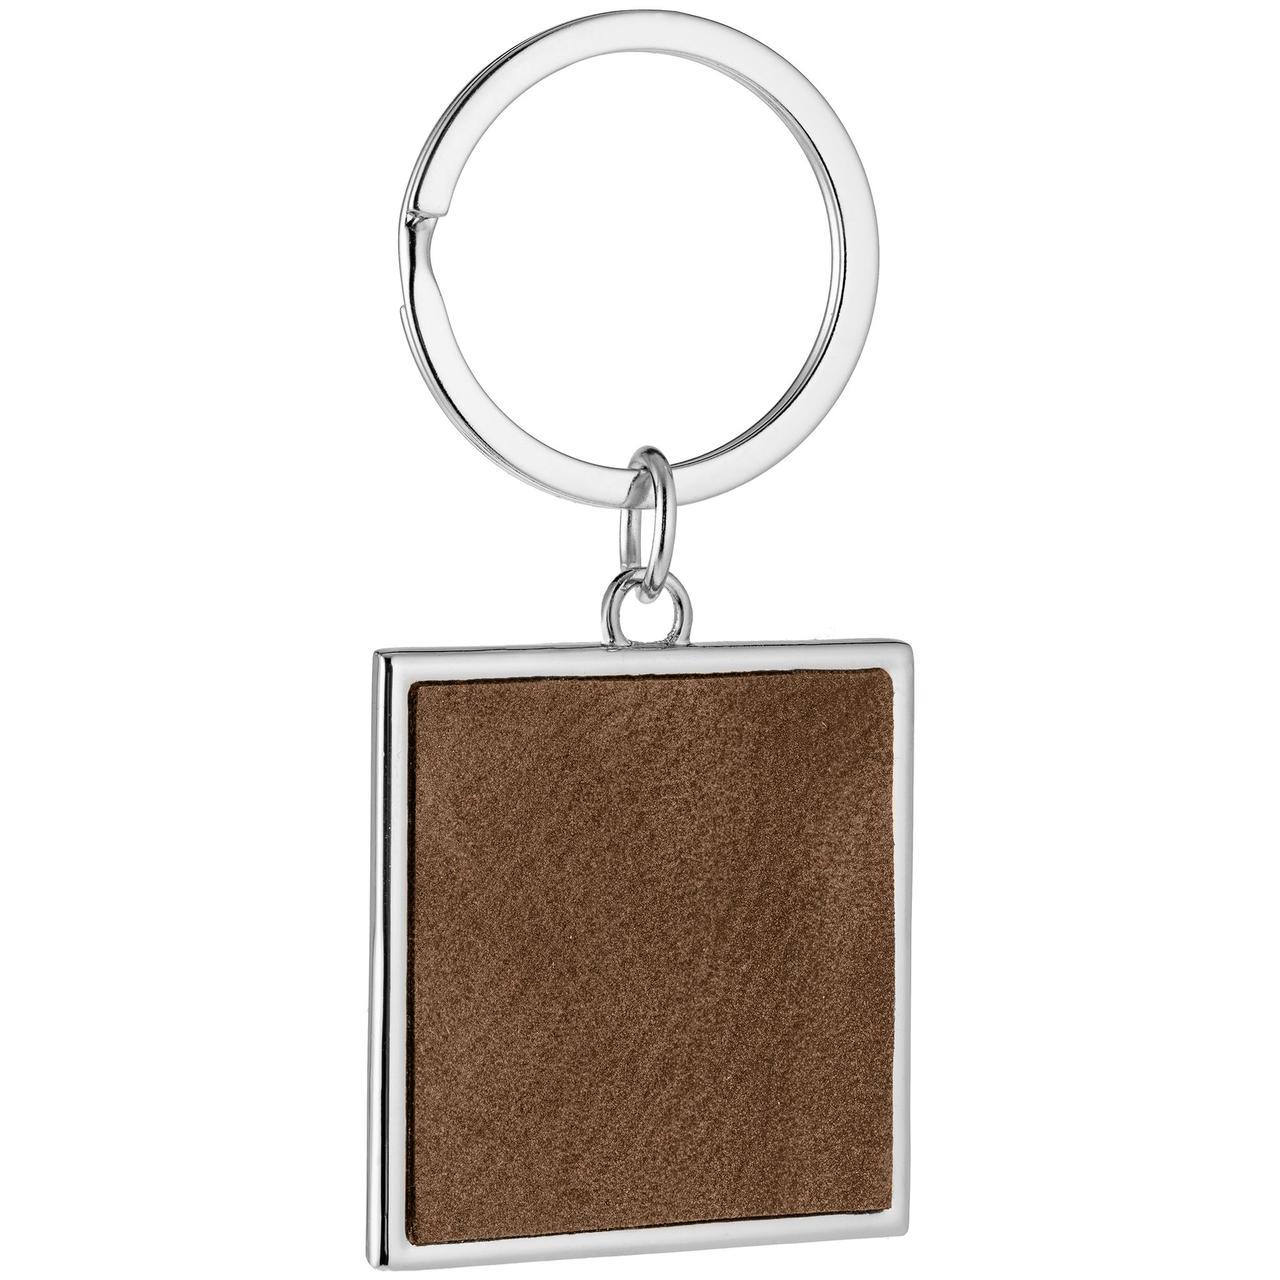 Брелок Brown Square, коричневый (артикул 684.59)